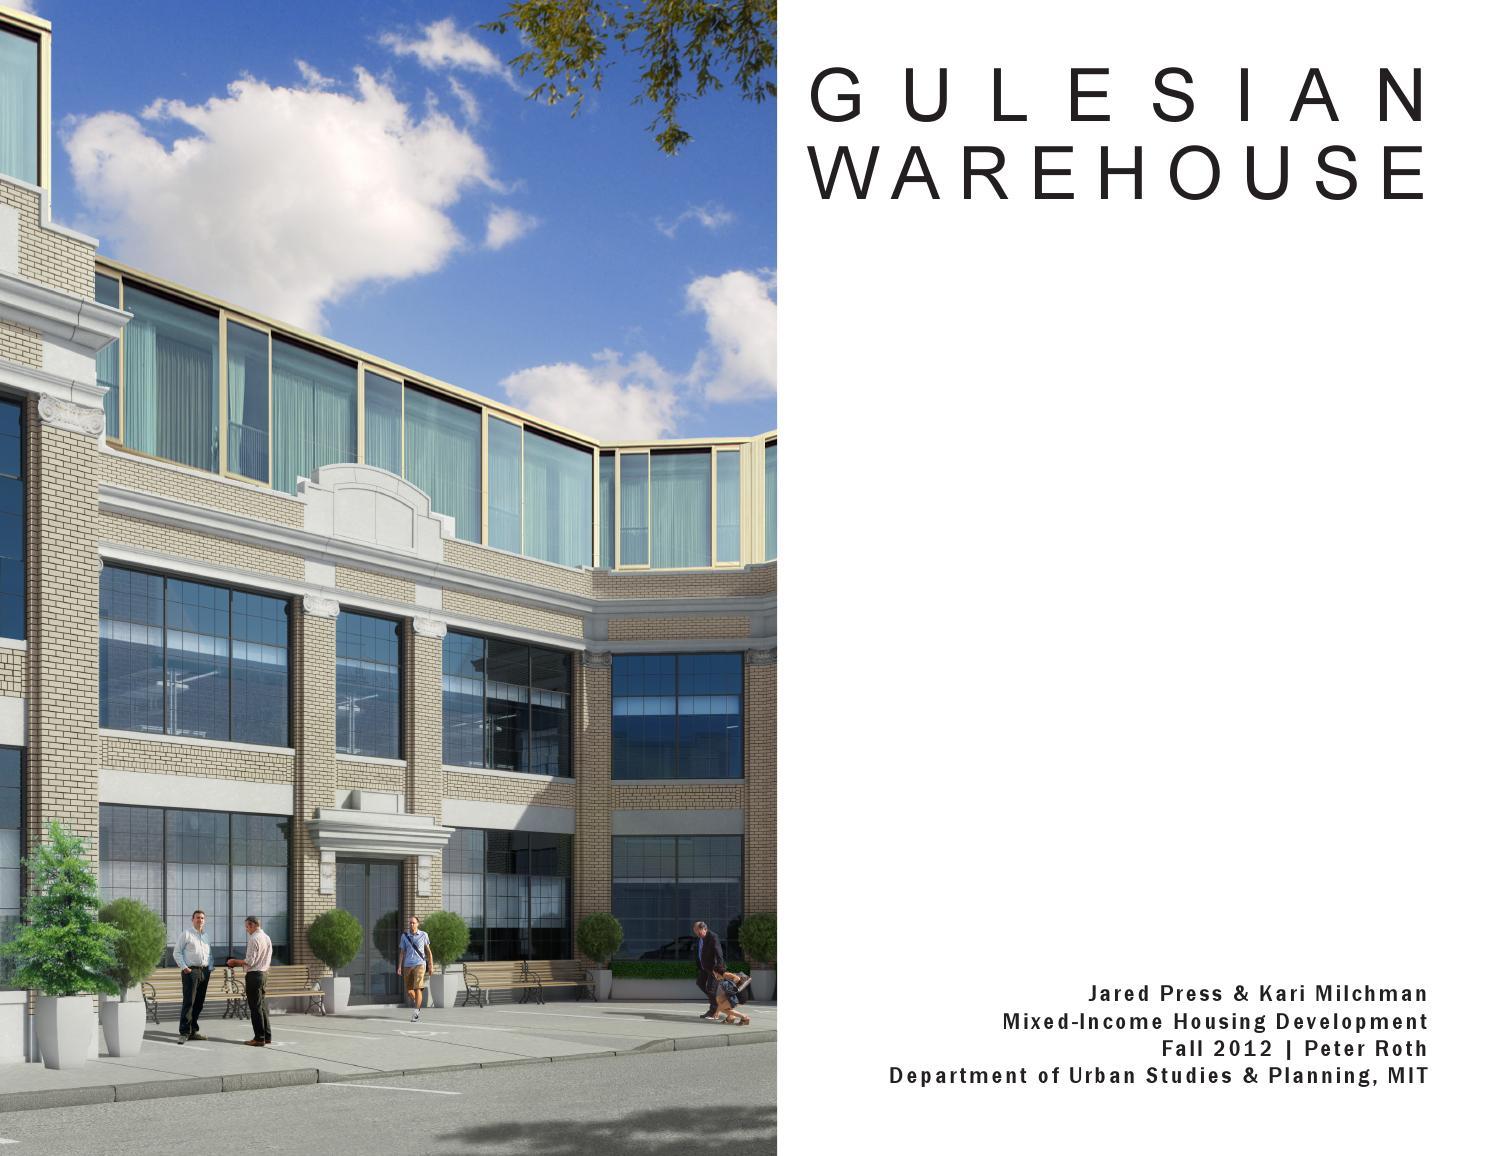 Gulesian Warehouse - A Mixed-Income Housing Development